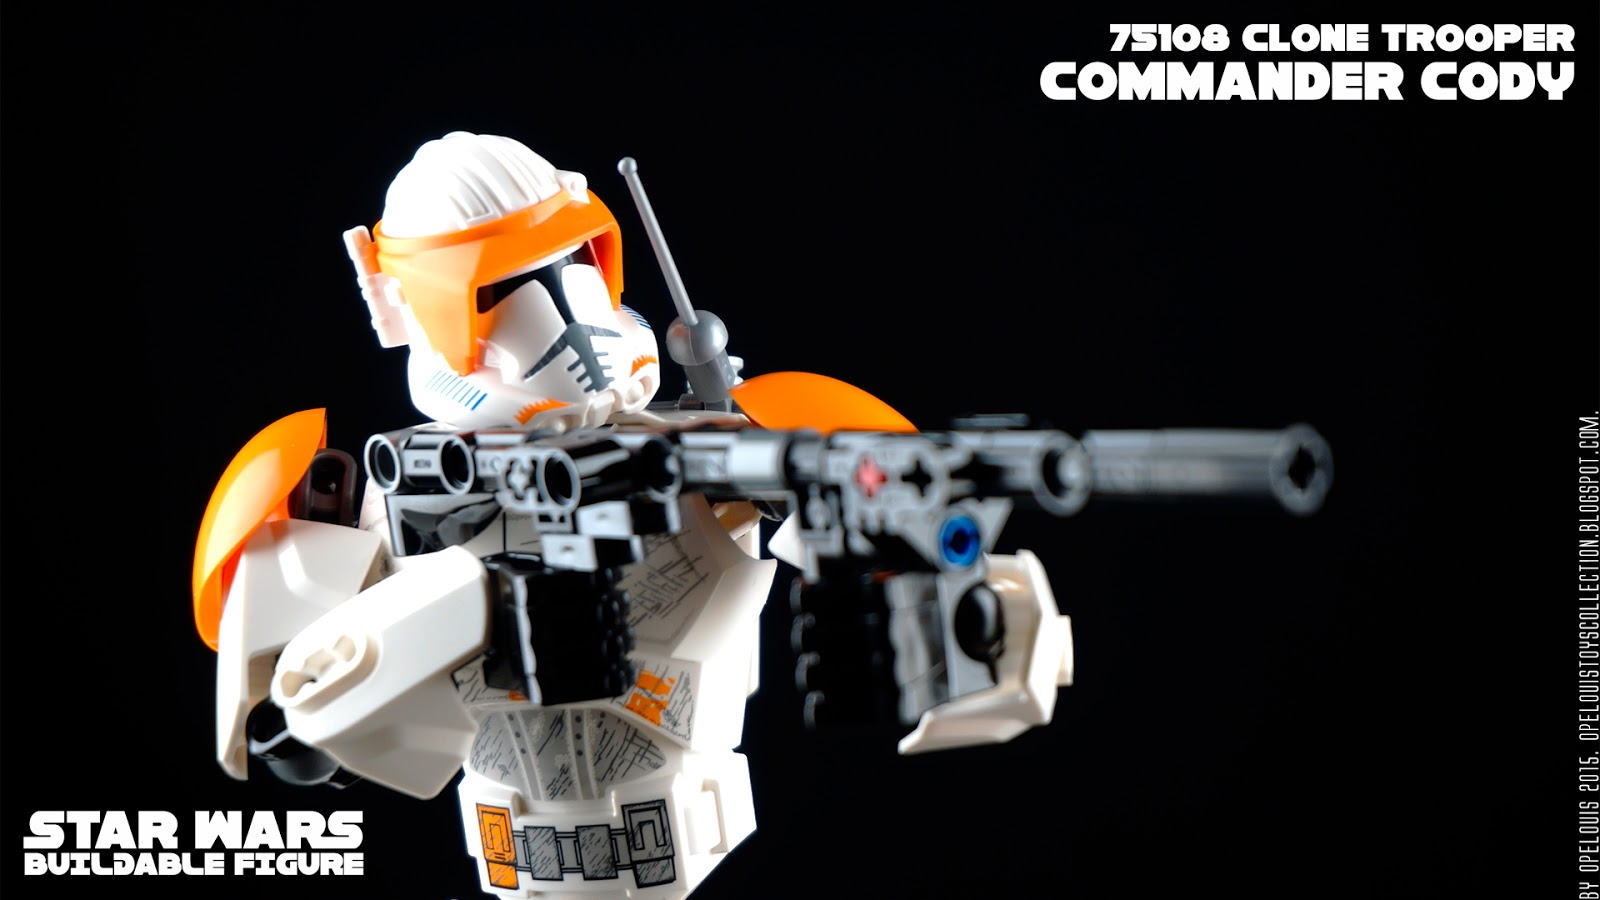 Star Wars Clone Trooper Wallpaper Coolest 1600x900 Download Hd Wallpaper Wallpapertip